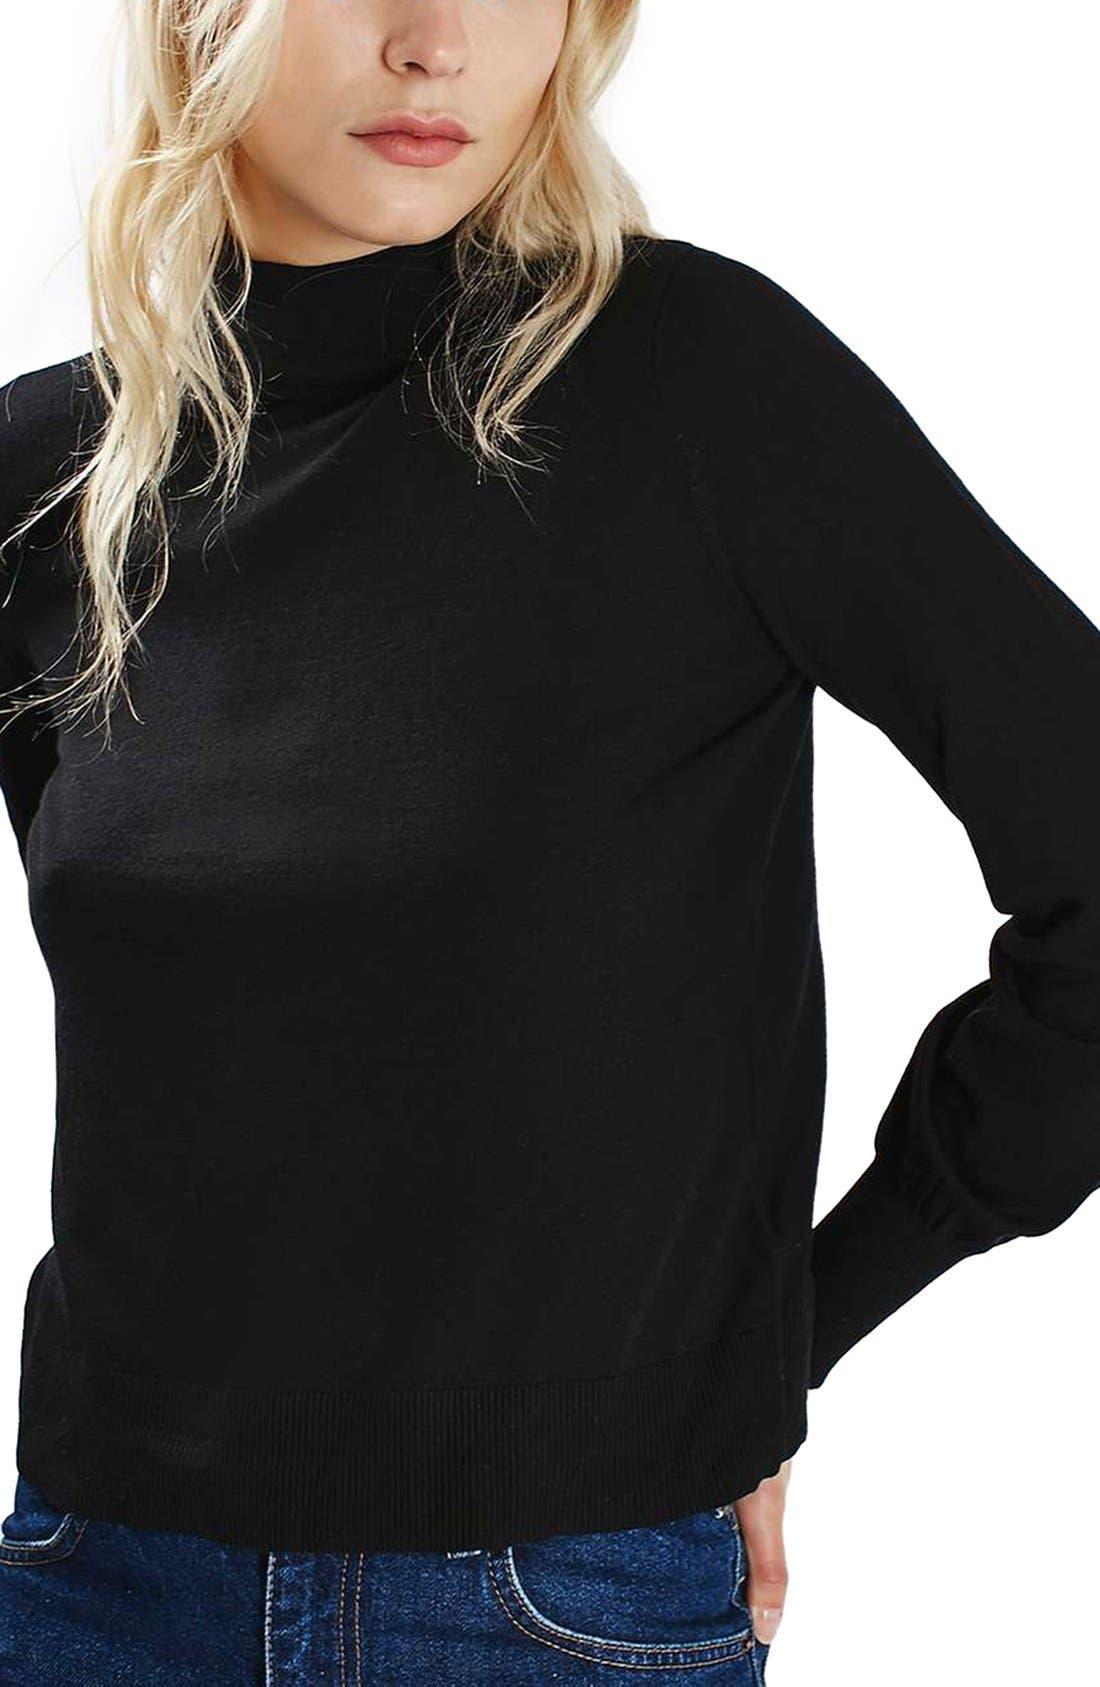 TOPSHOP, Blouson Sleeve Mock Neck Sweater, Main thumbnail 1, color, 001